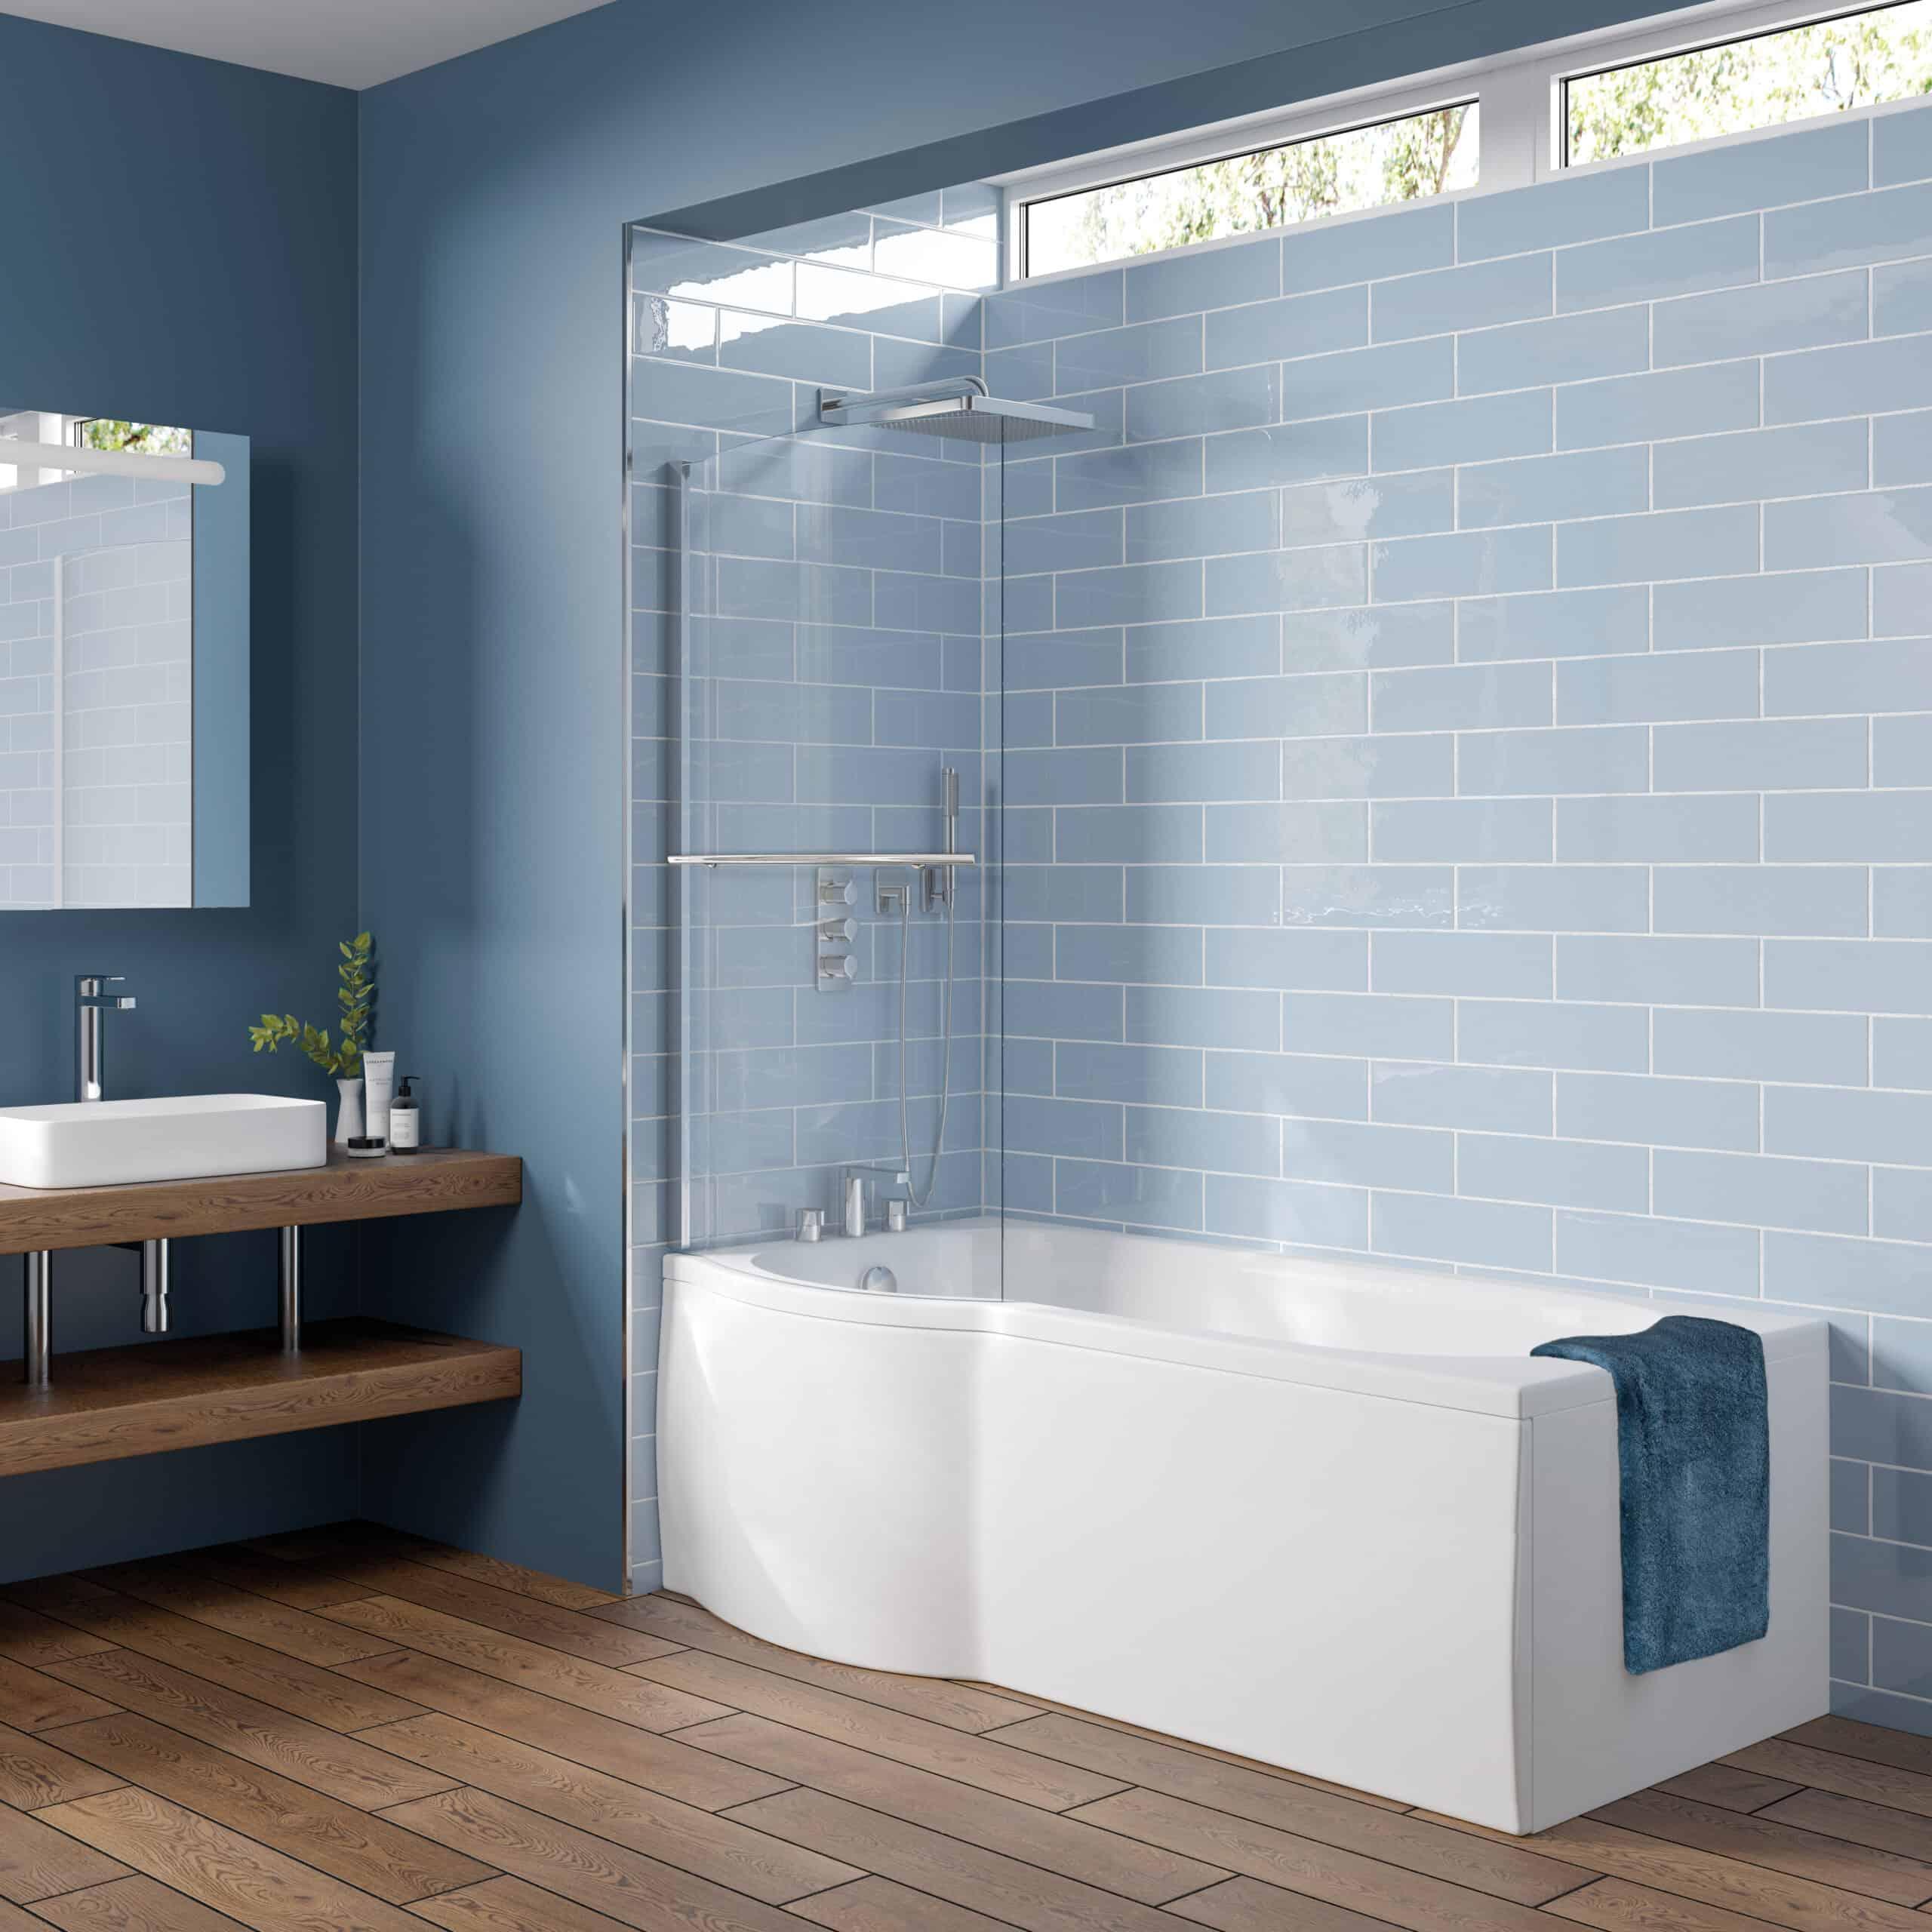 Trojan Concert P-Shaped Shower Bath